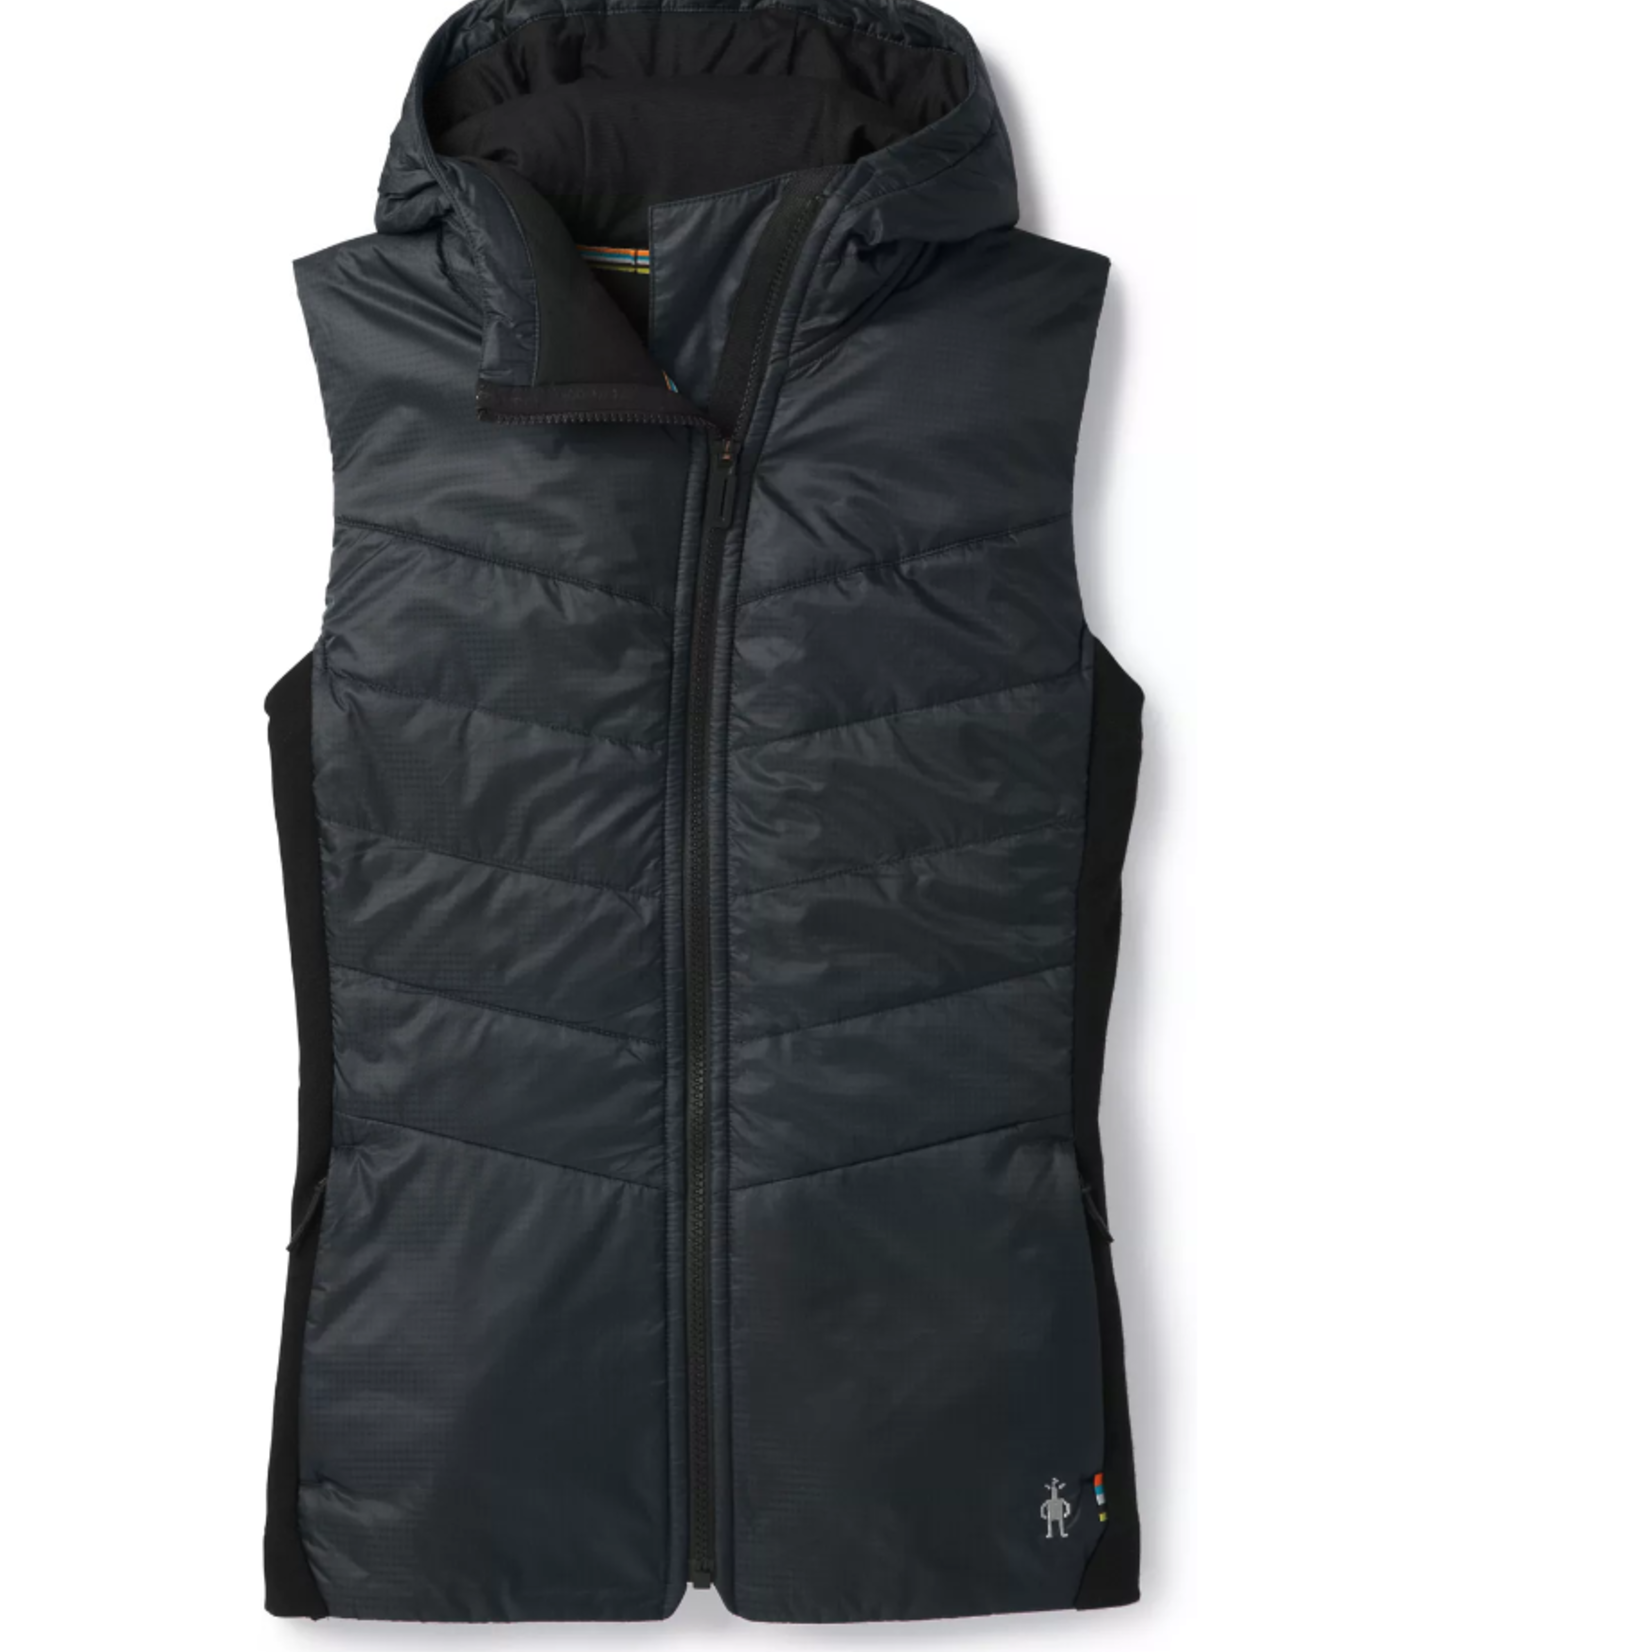 Smartwool Smartwool W's Smartloft 60 Hoodie Vest